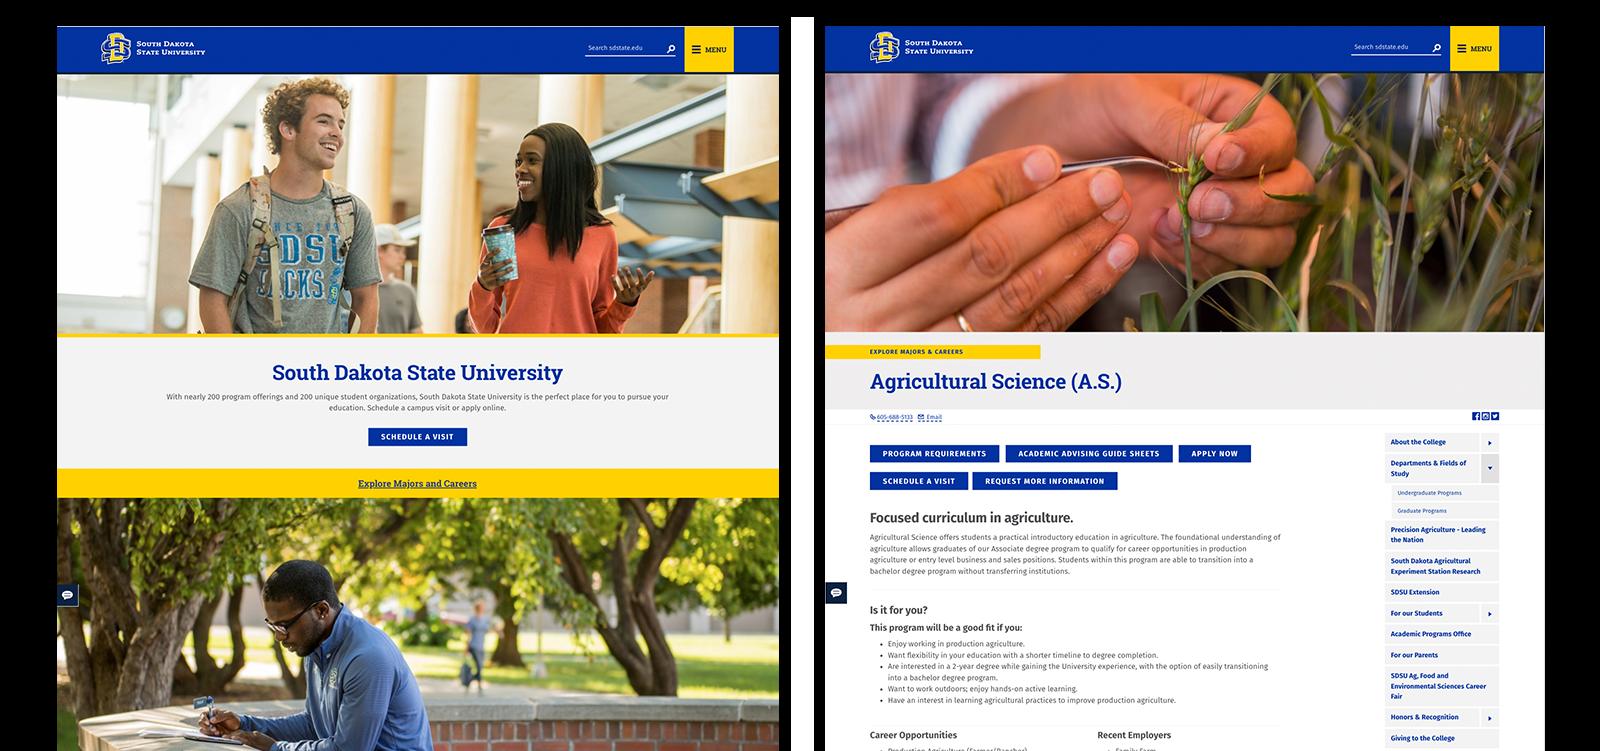 South Dakota State University website